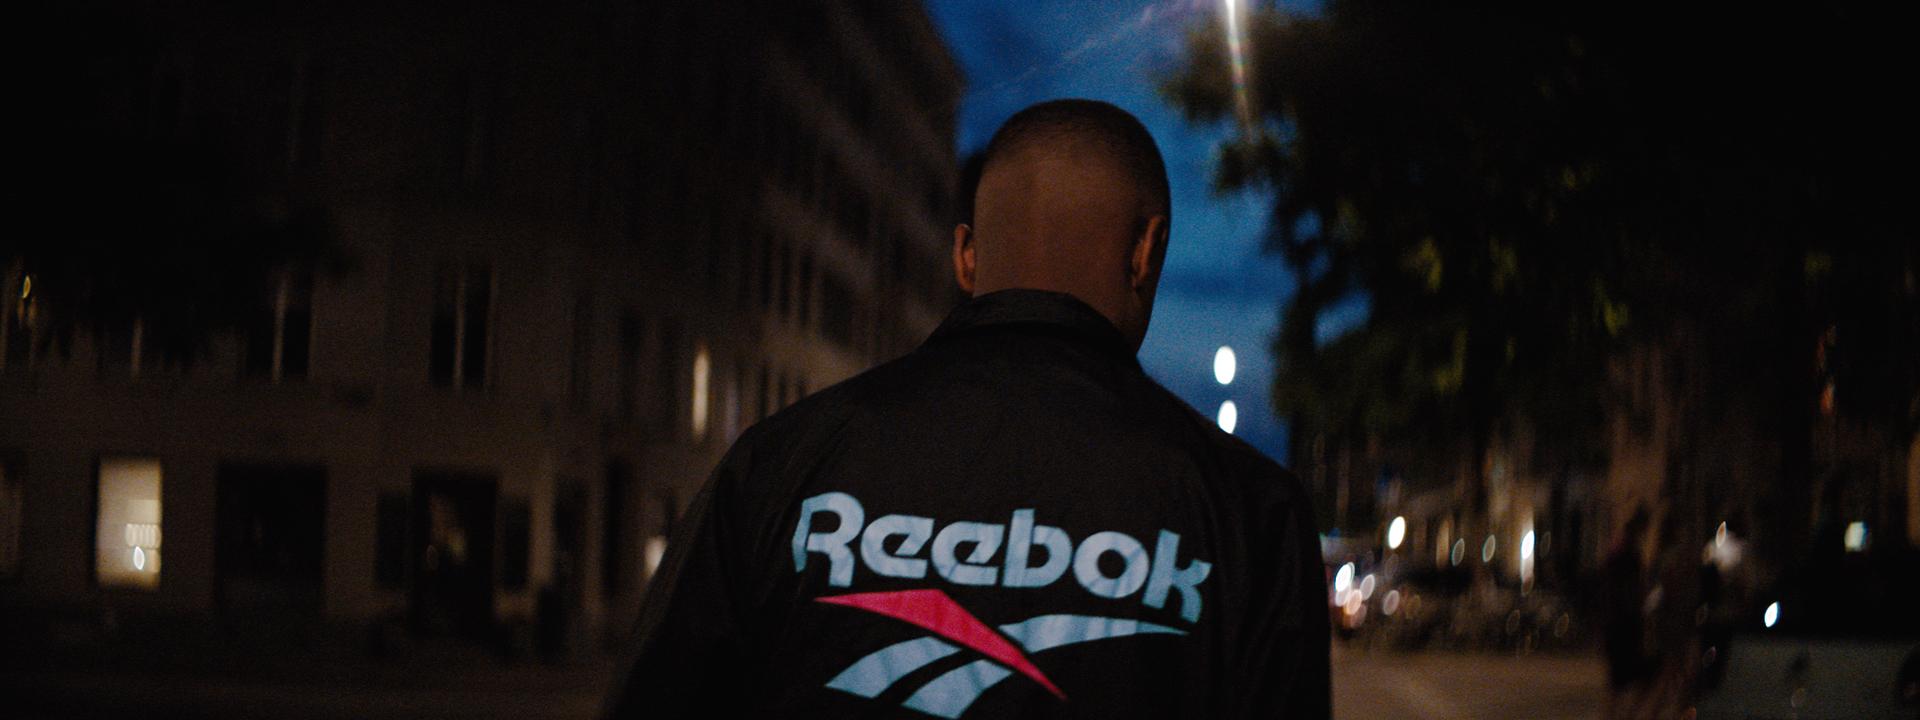 reebok_nordics__1.1.5.jpg